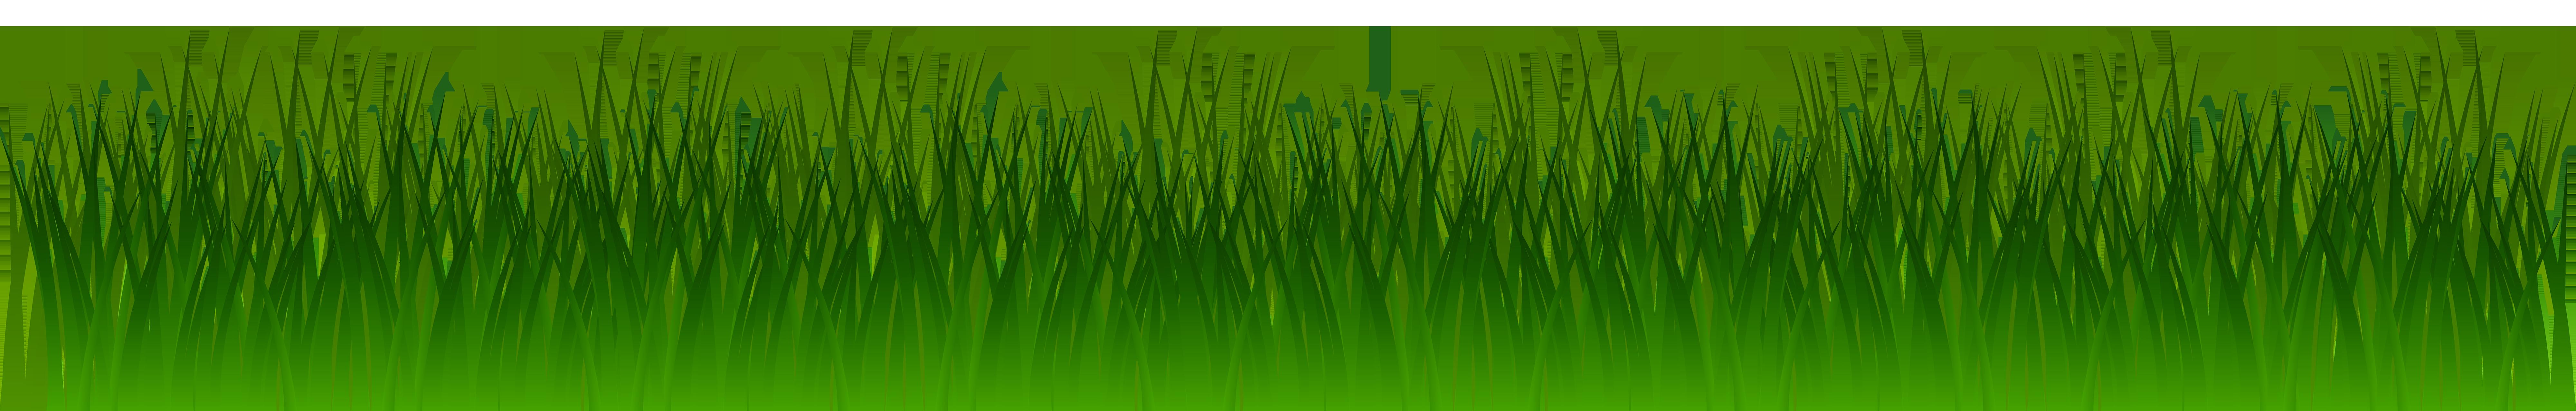 svg download Lawnmower clipart lawn work. Dark grass png clip